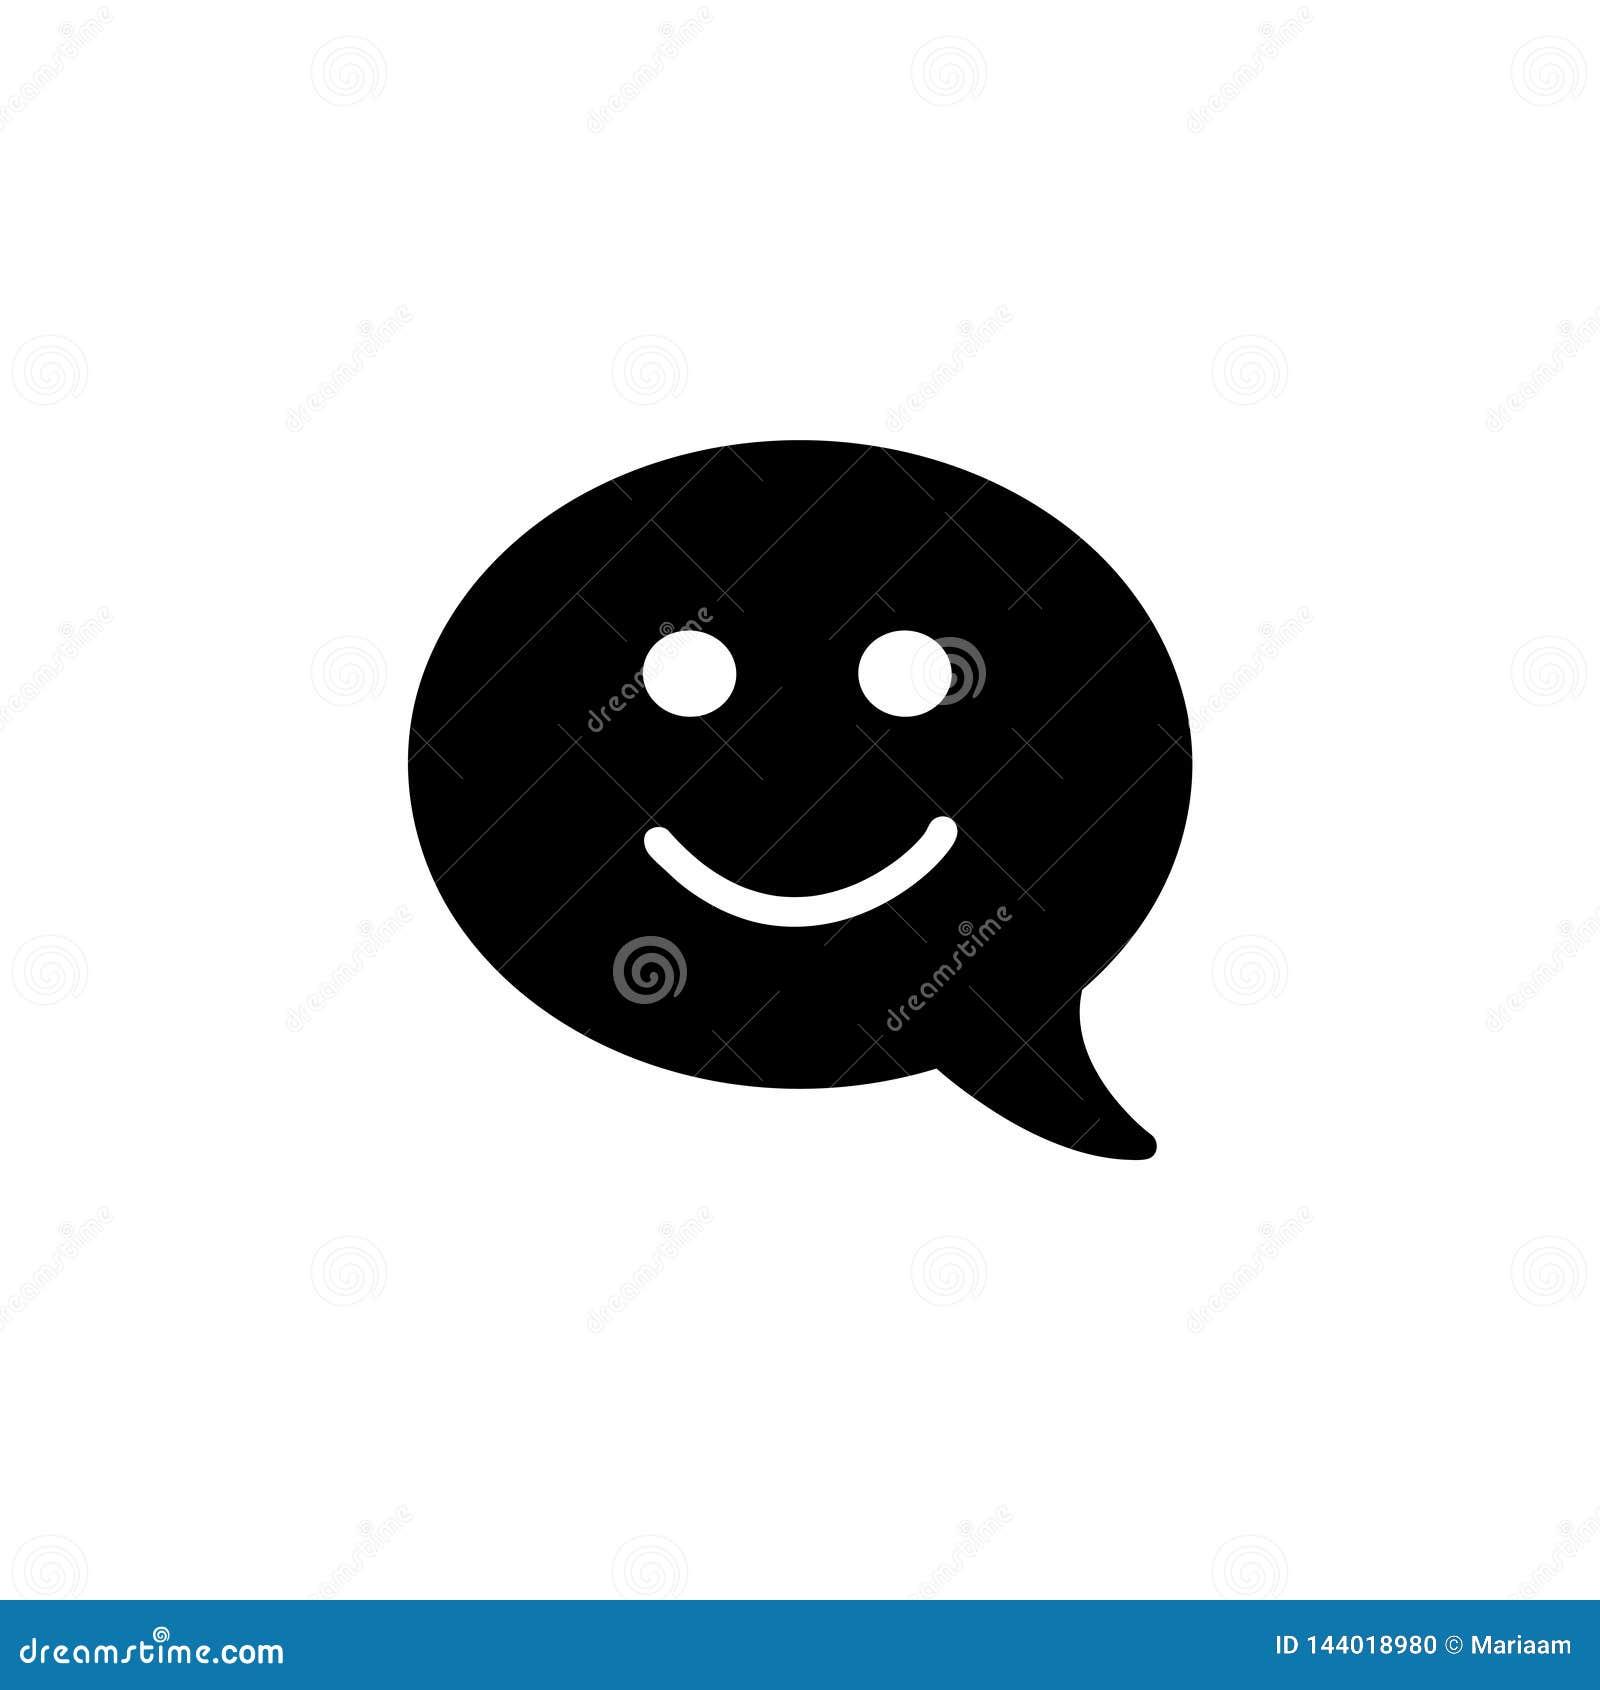 Embleem van het advies het vlakke ontwerp met toespraakbel en smiley